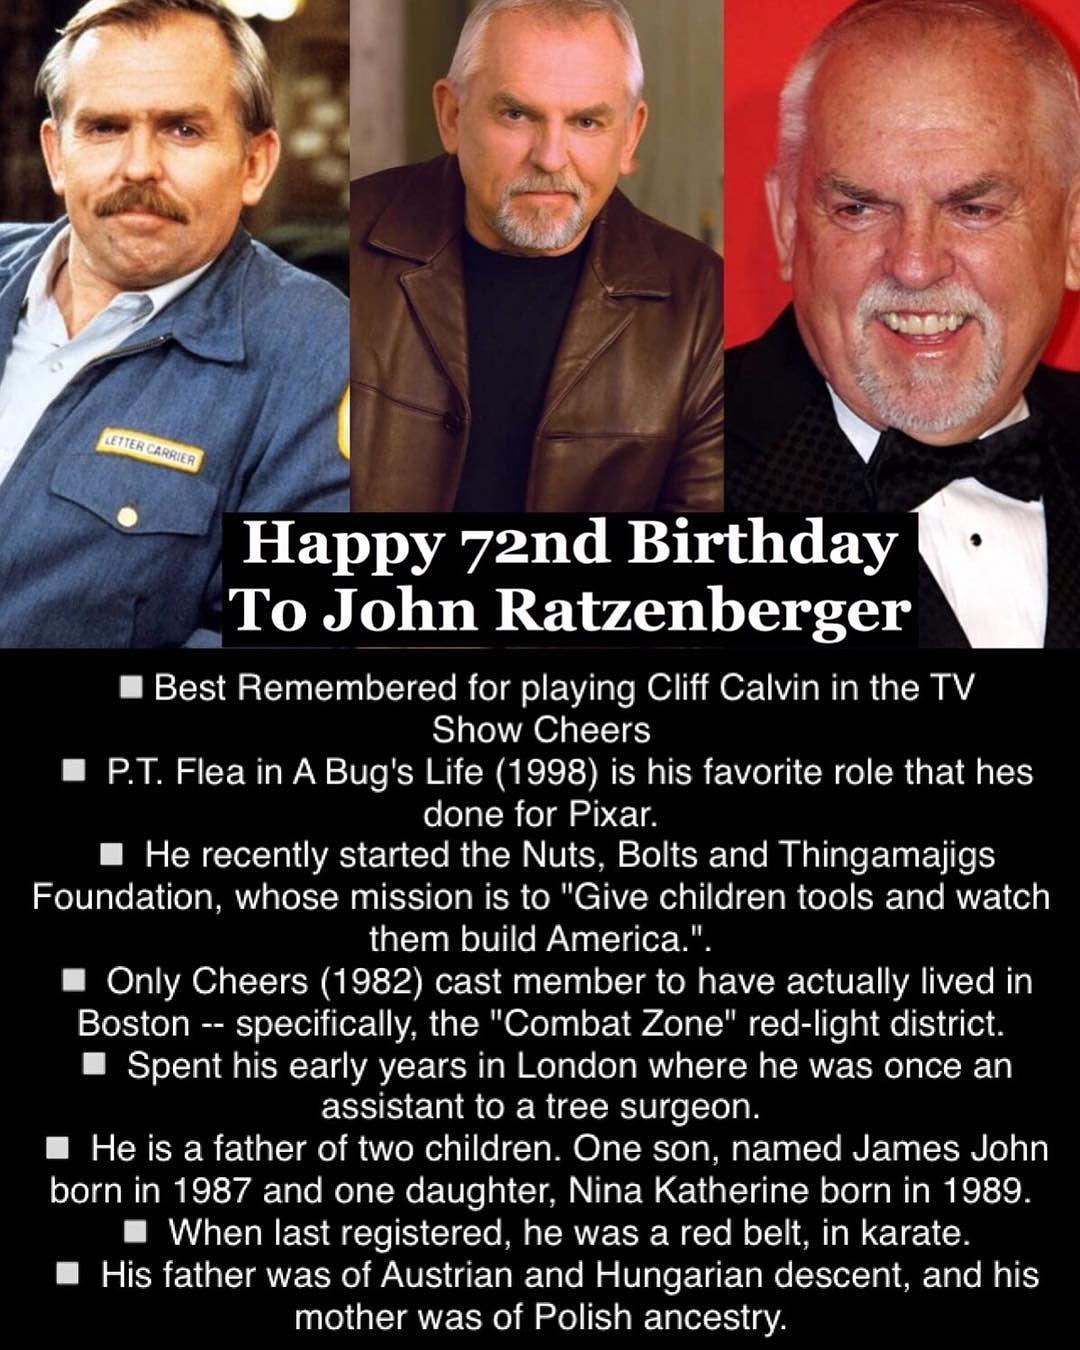 April 6: Happy 72nd Birthday to John Ratzenberger